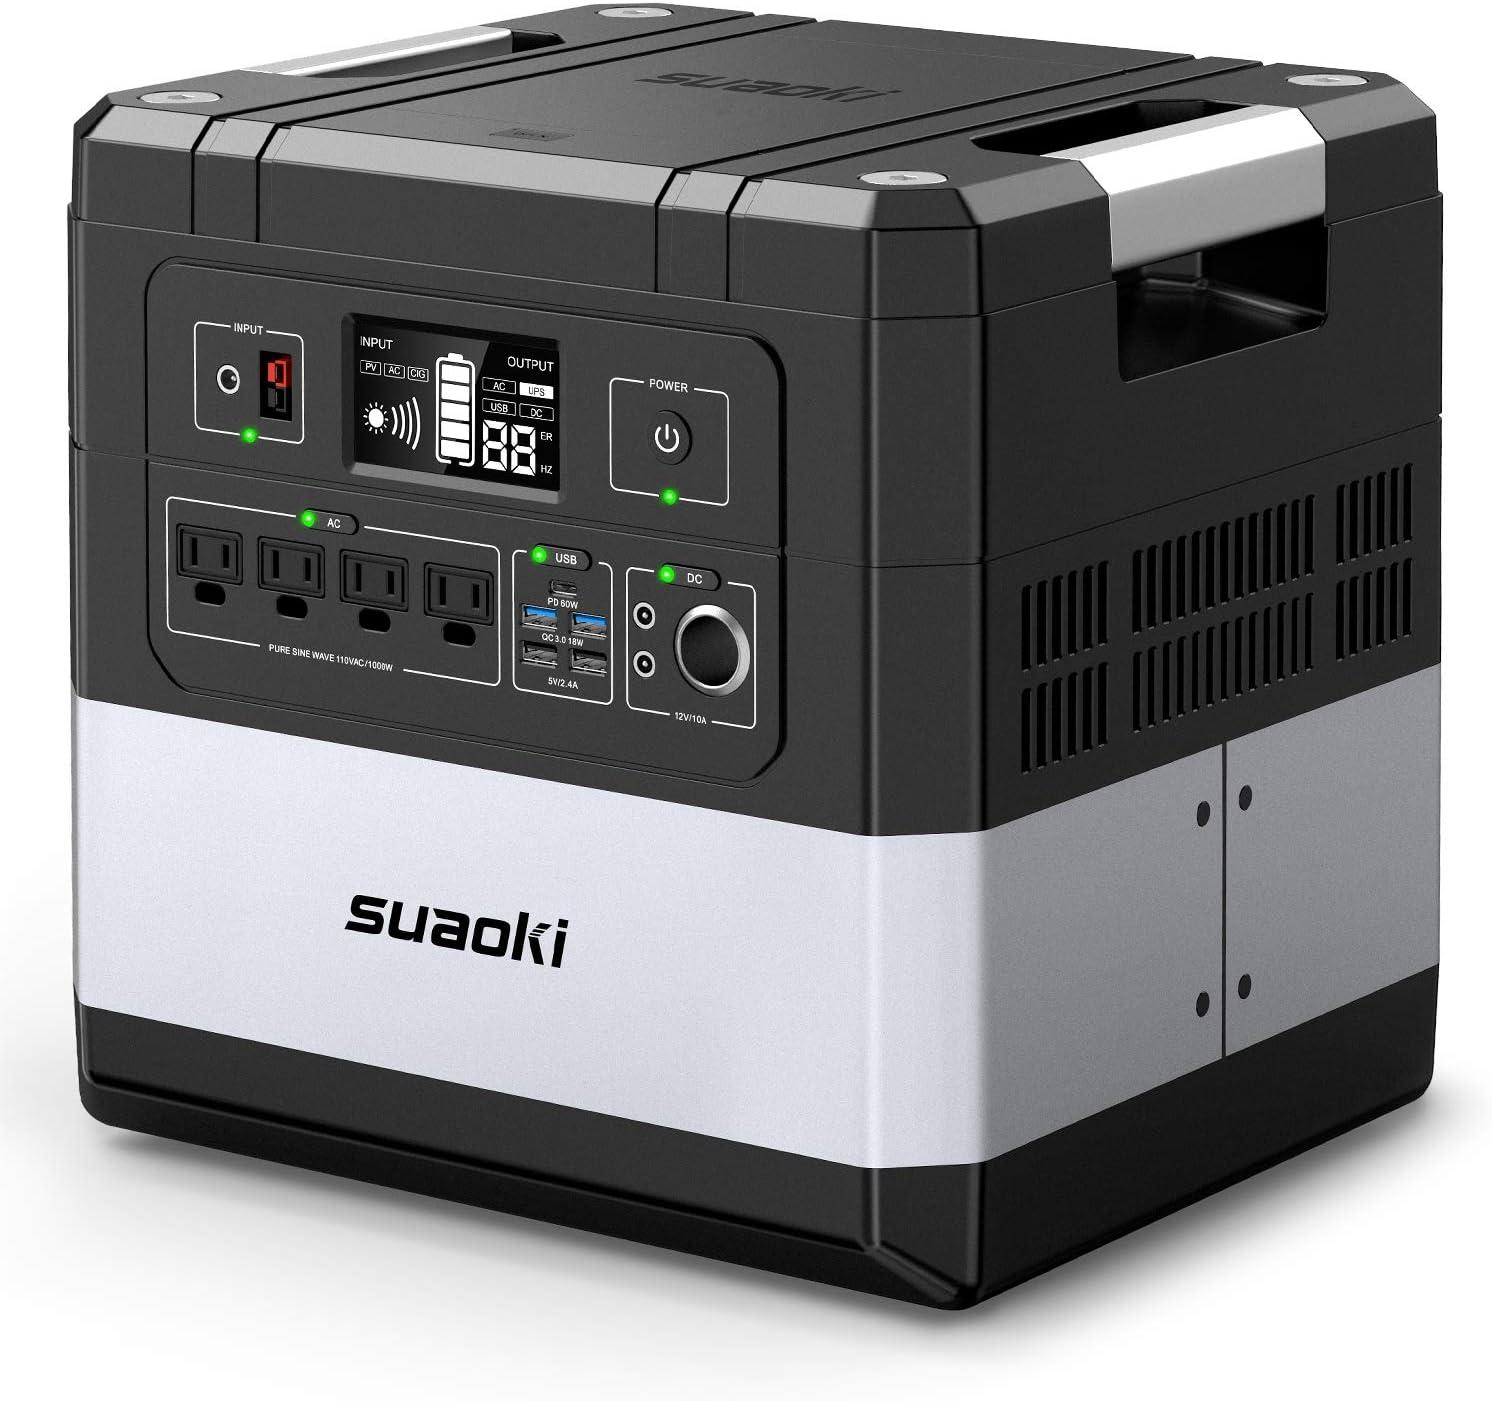 suaoki ポータブル電源 G1000 超大容量 369600mAh/1182.72Wh